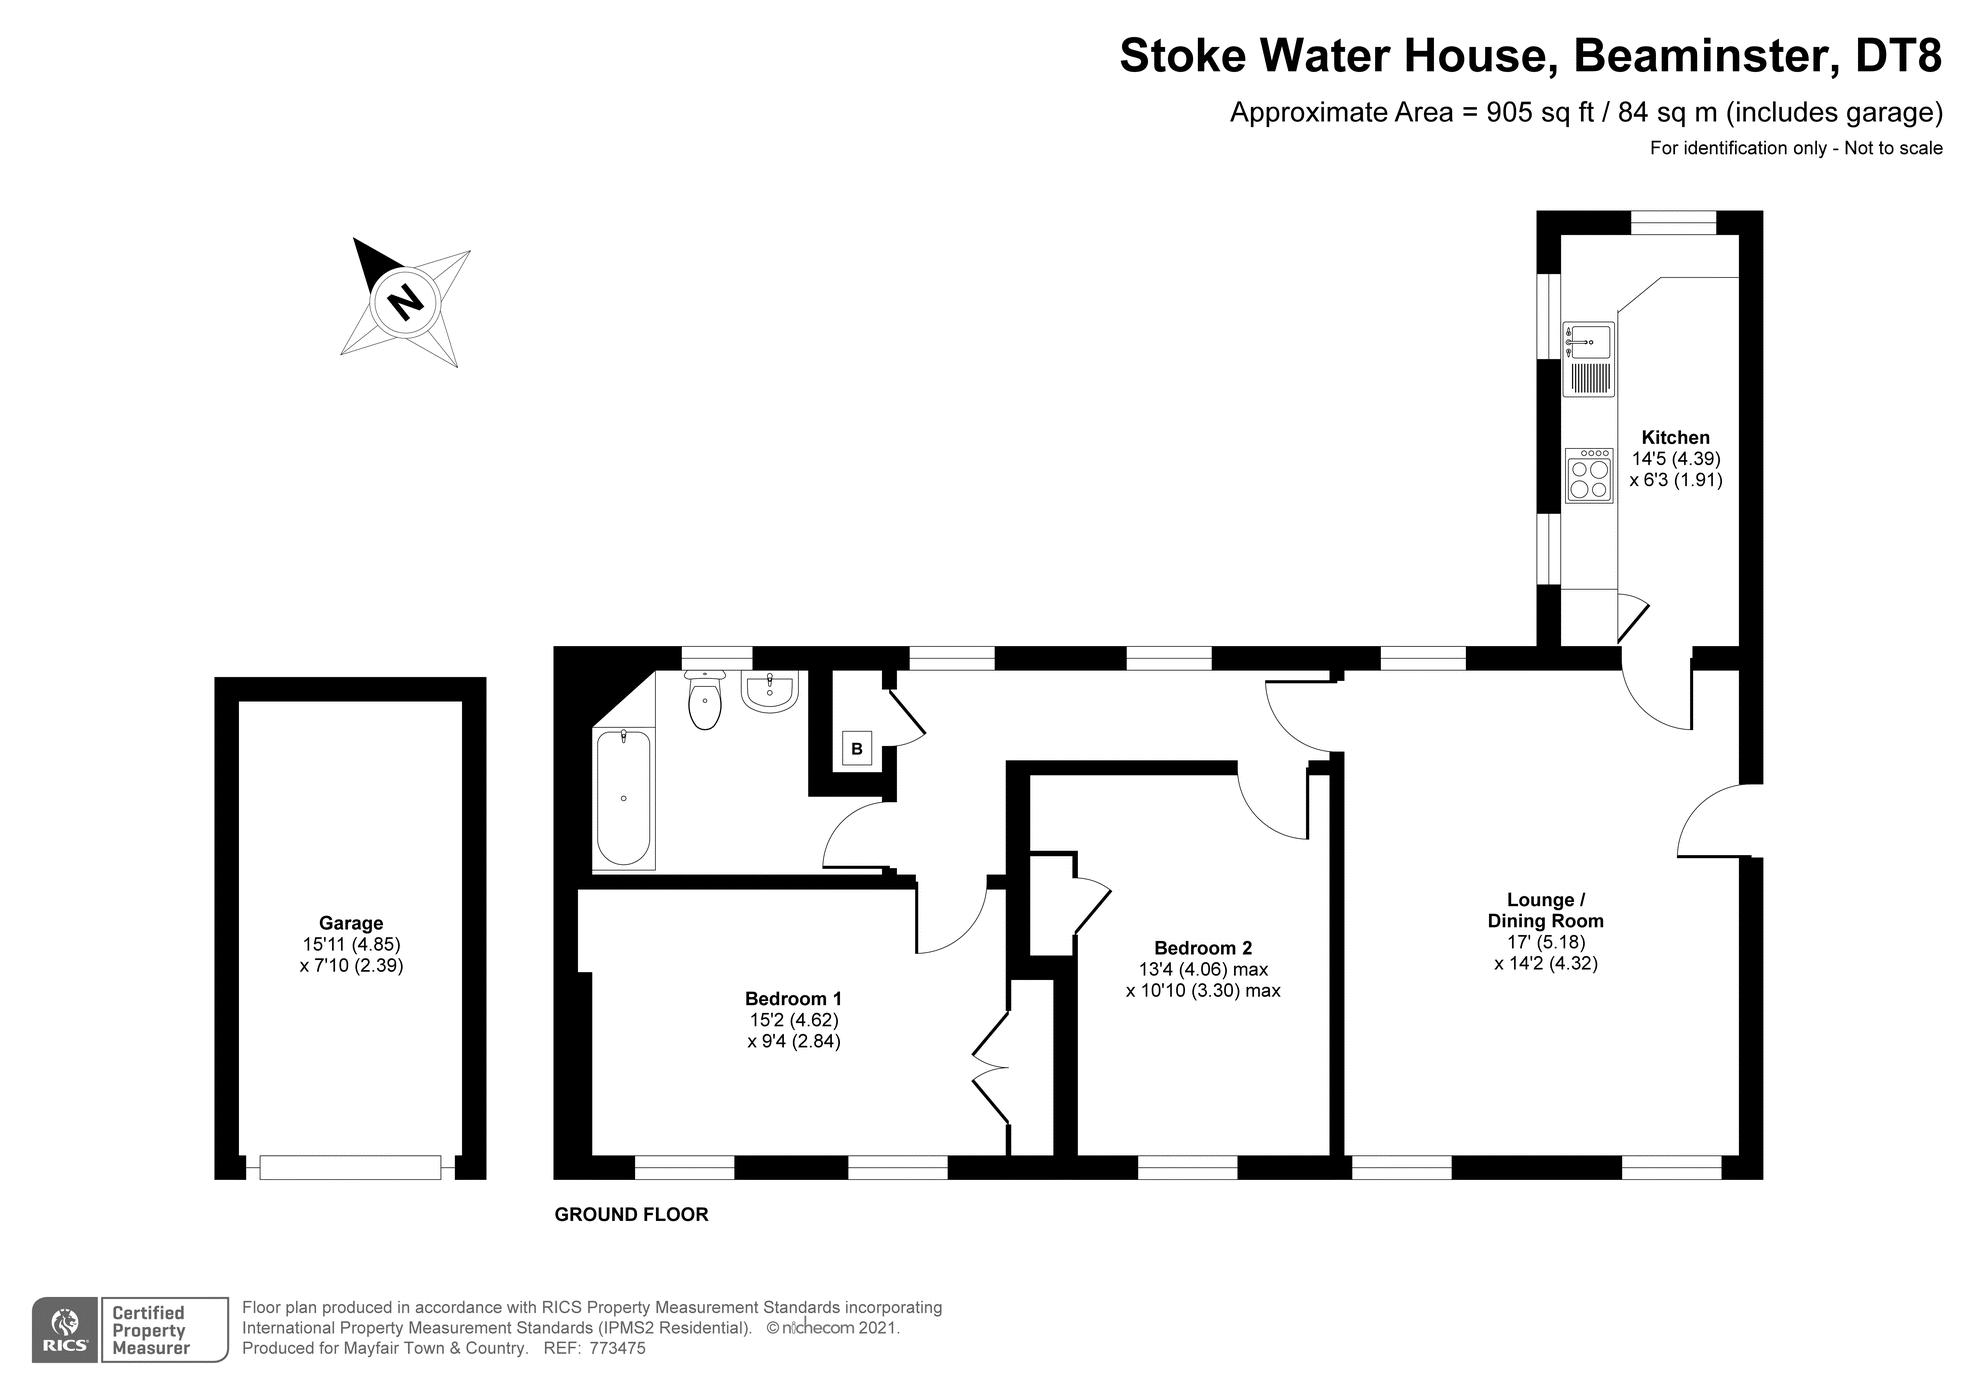 Stoke Water House